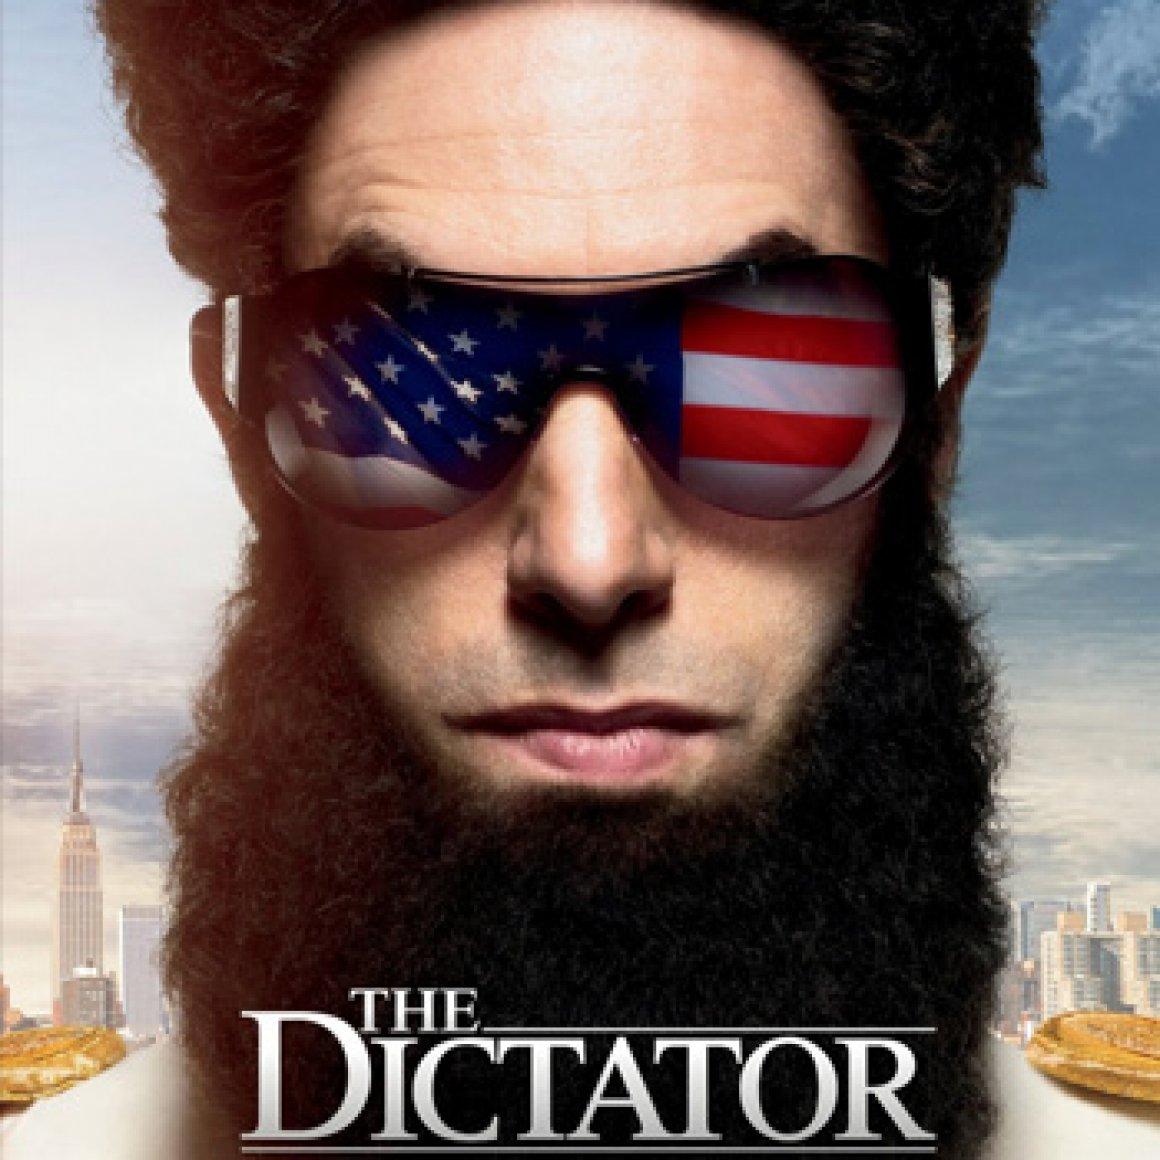 prod the.dictator 02 1160x1160 1 - Tax rebate